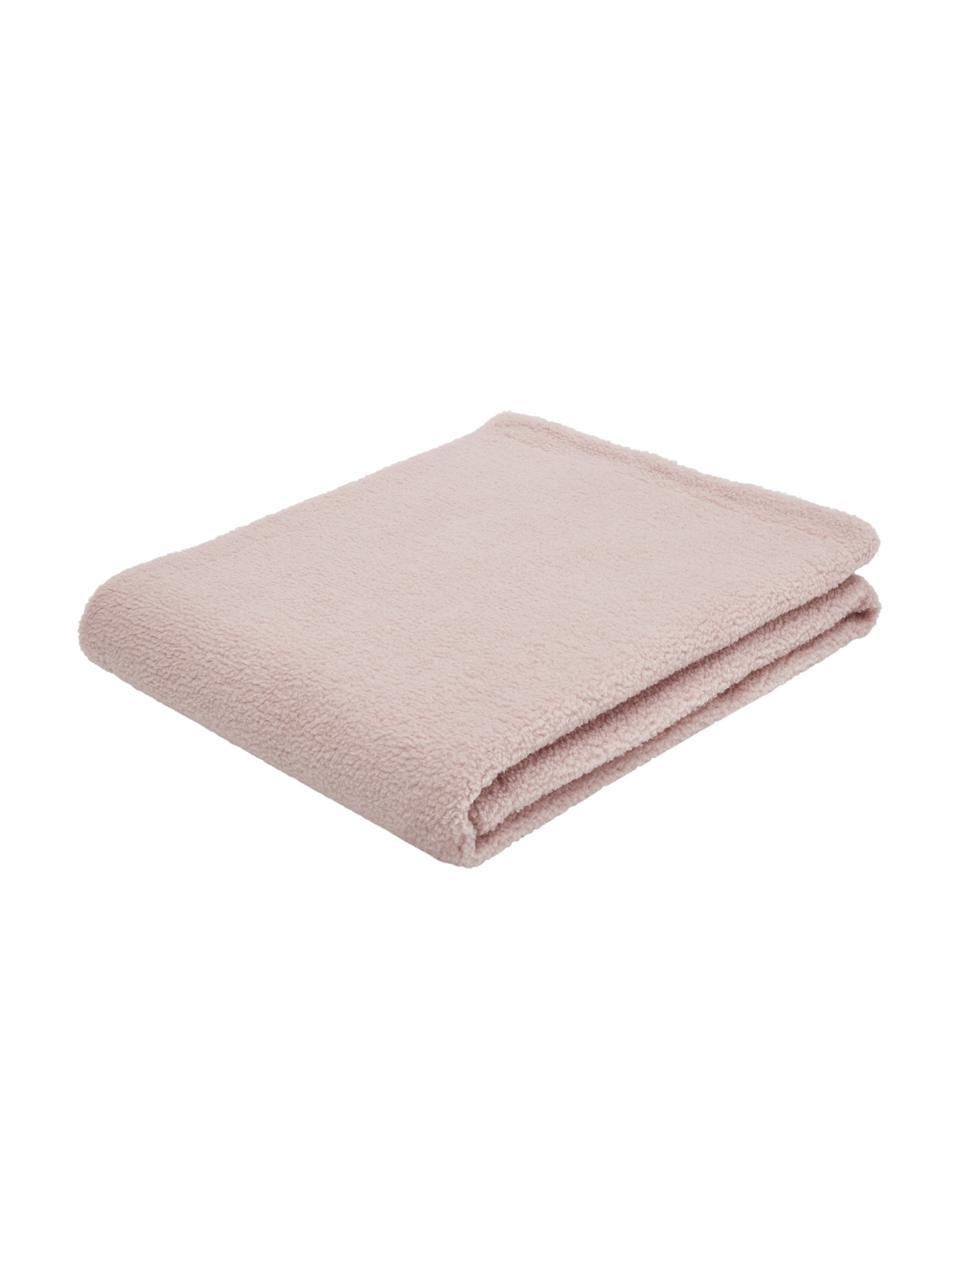 Teddy-Plaid Mille, Vorderseite: 100% Polyester (Teddyfell, Rückseite: 100% Polyester, Rosa, 150 x 200 cm